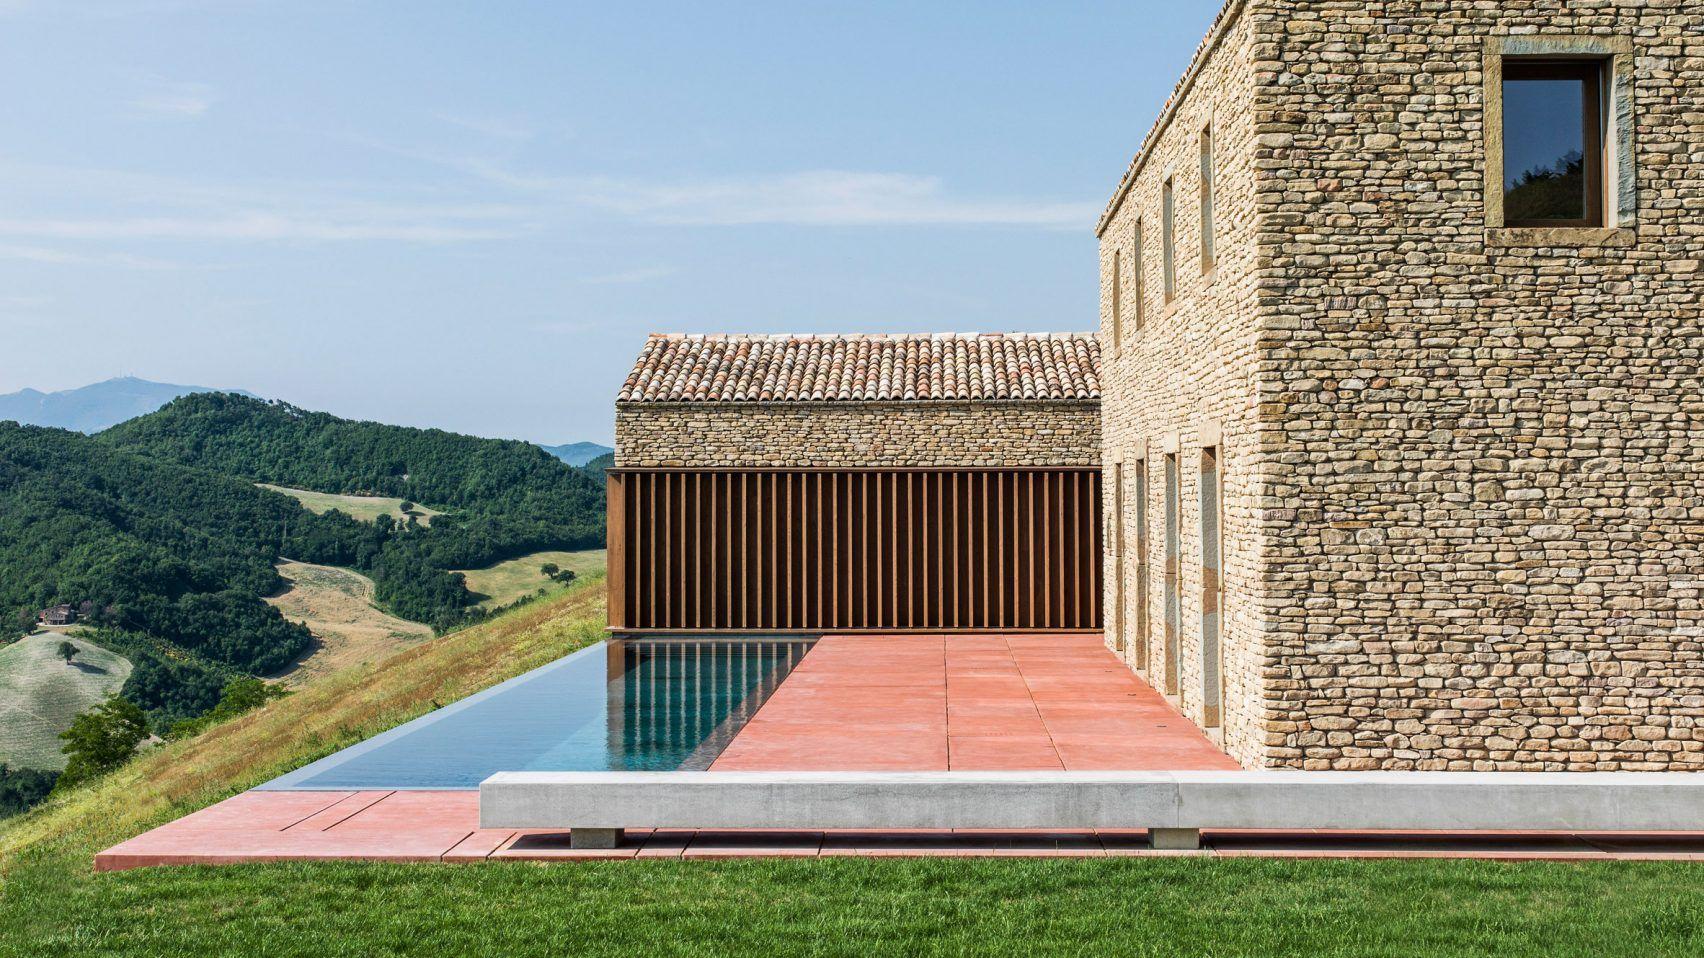 Photography ezio manciucca sweet home make interior decoration design ideas decor also  rh pinterest